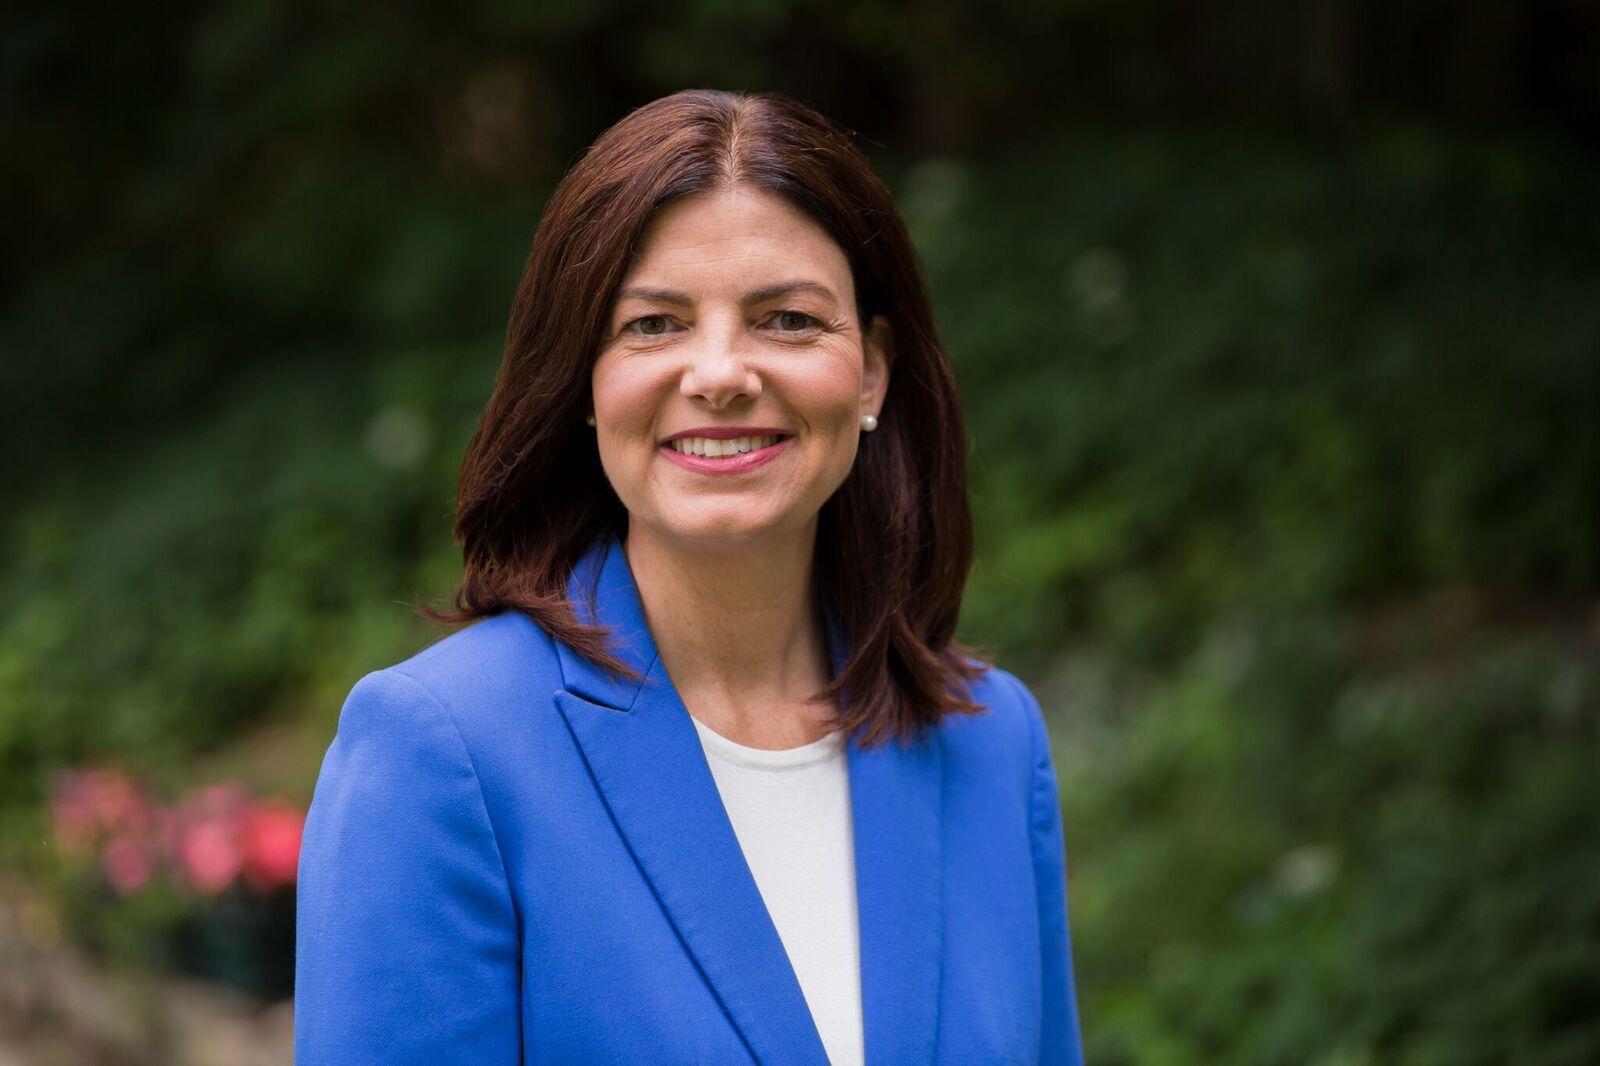 Former U.S. Senator Kelly Ayotte